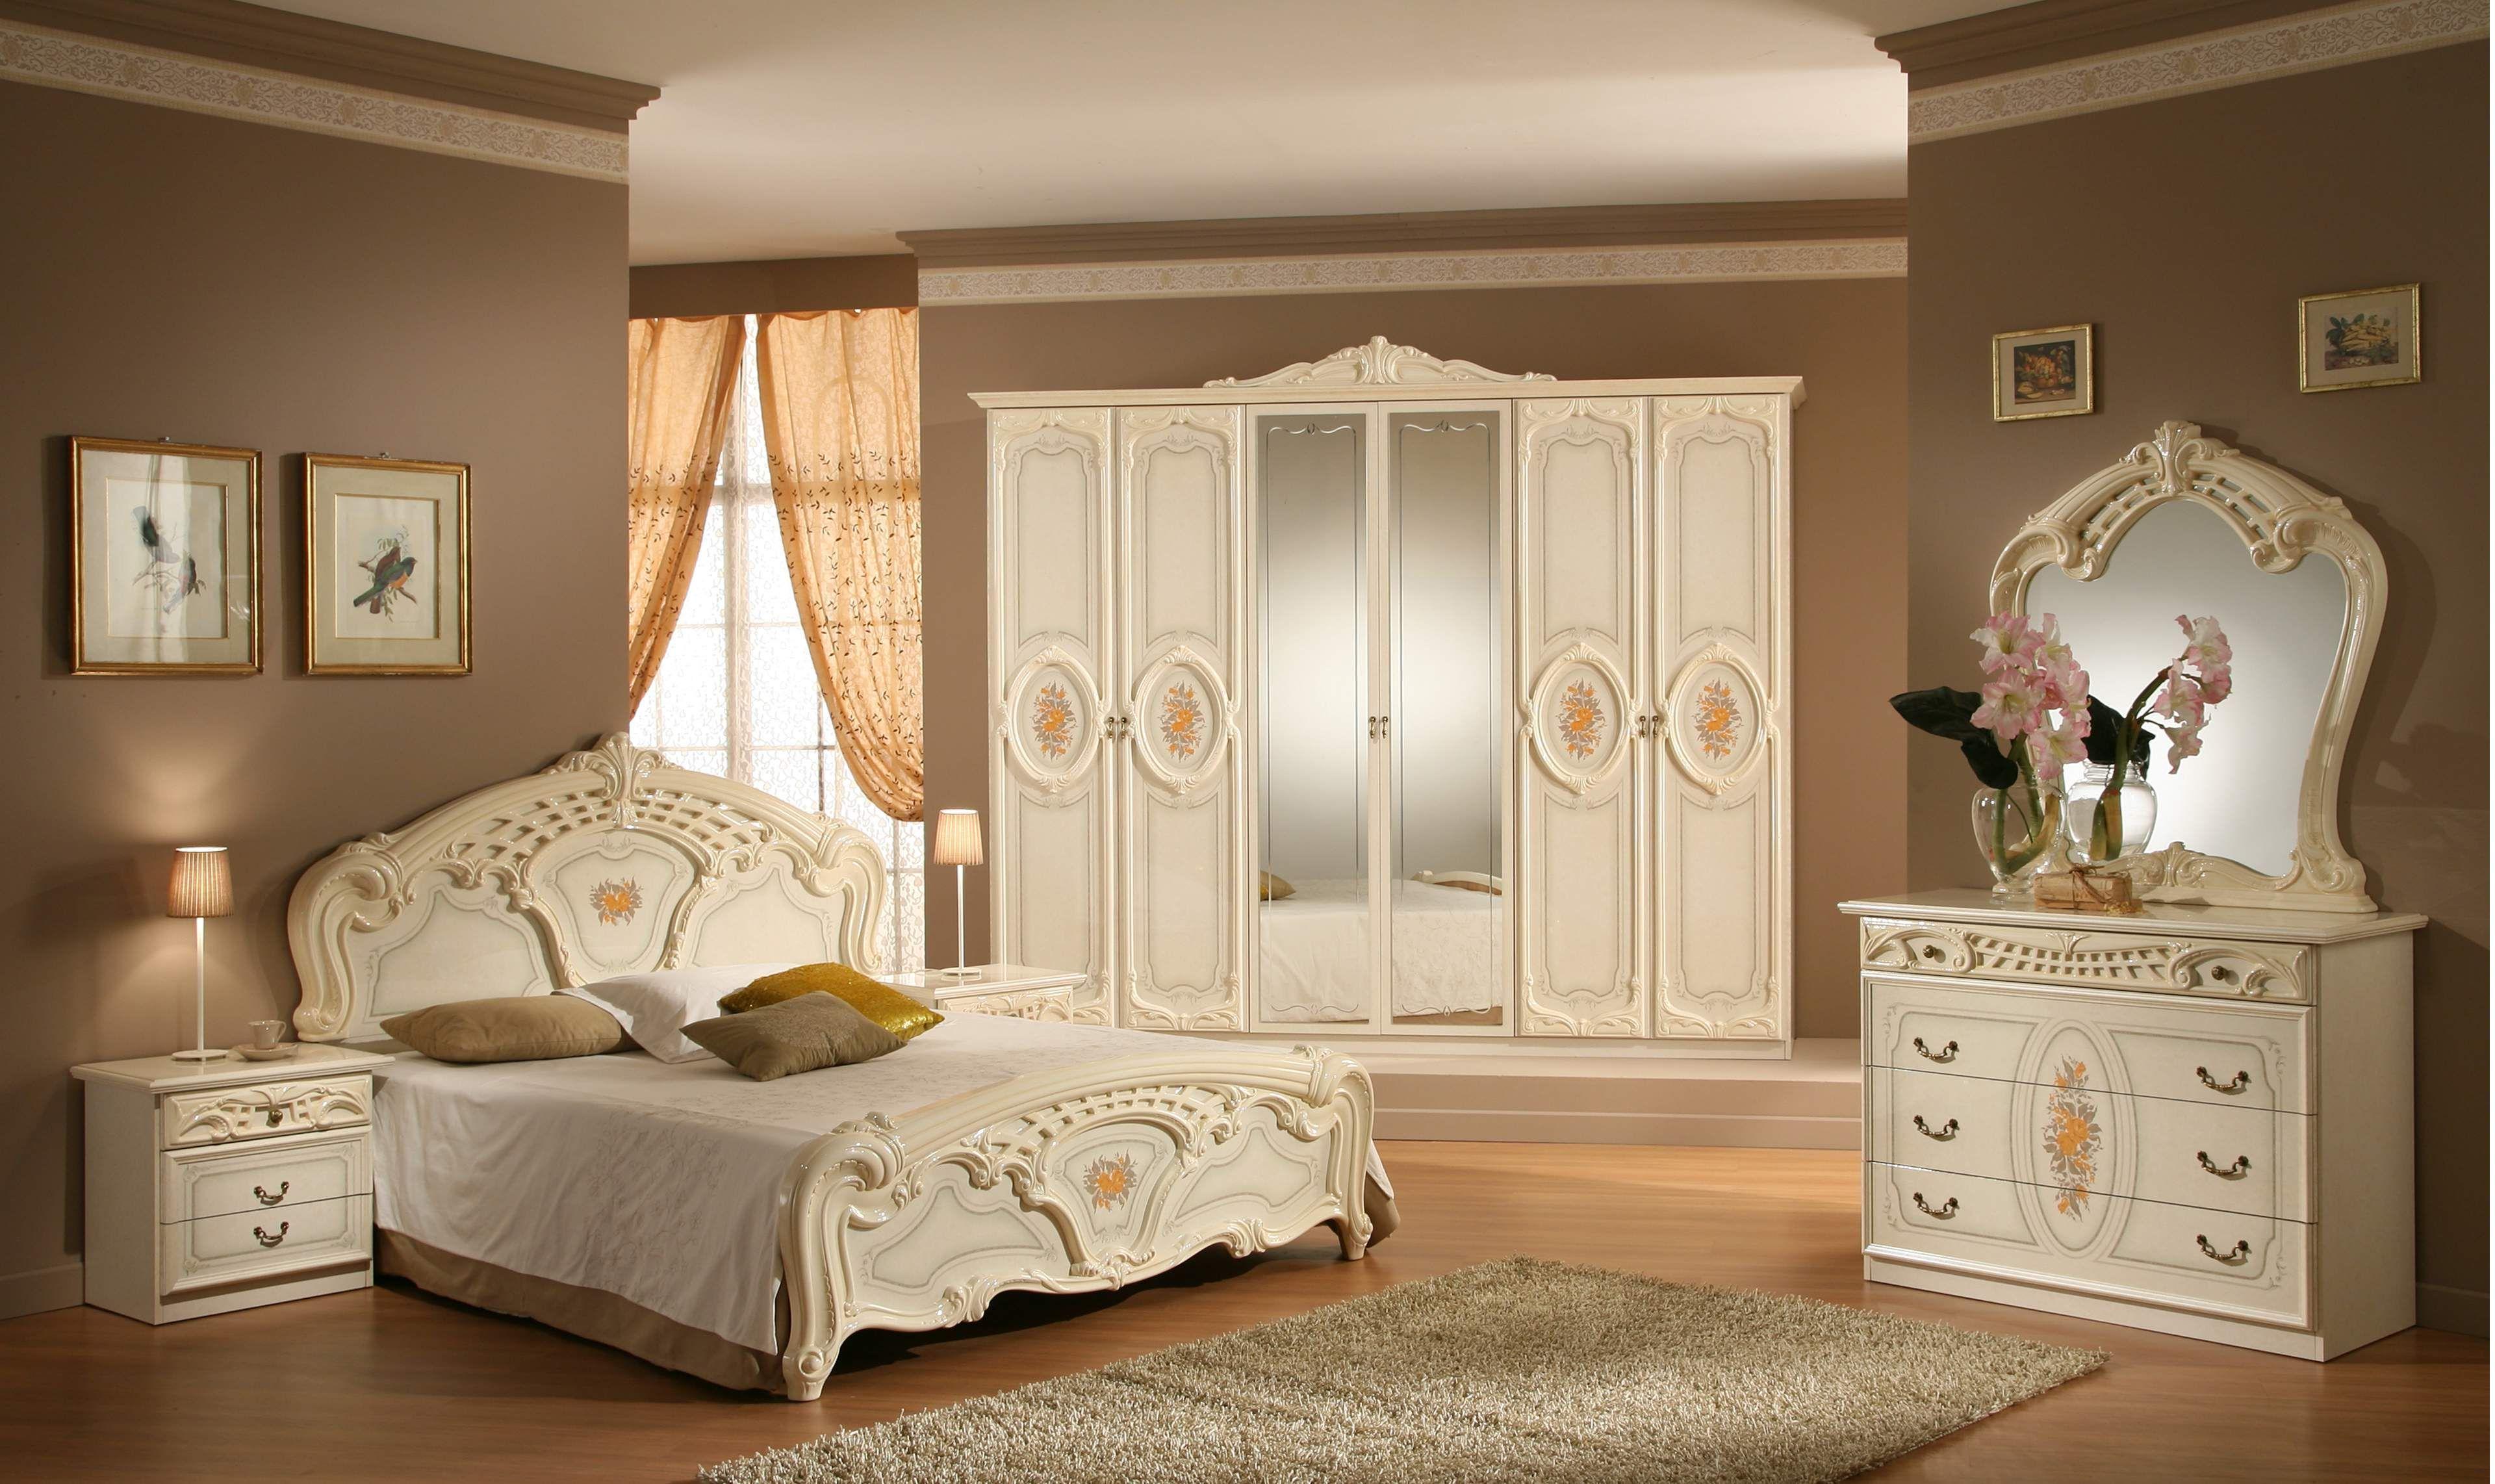 New Bedroom Design Bedroom Modern White Furniture Cool Beds Loft For Kids Bunk With